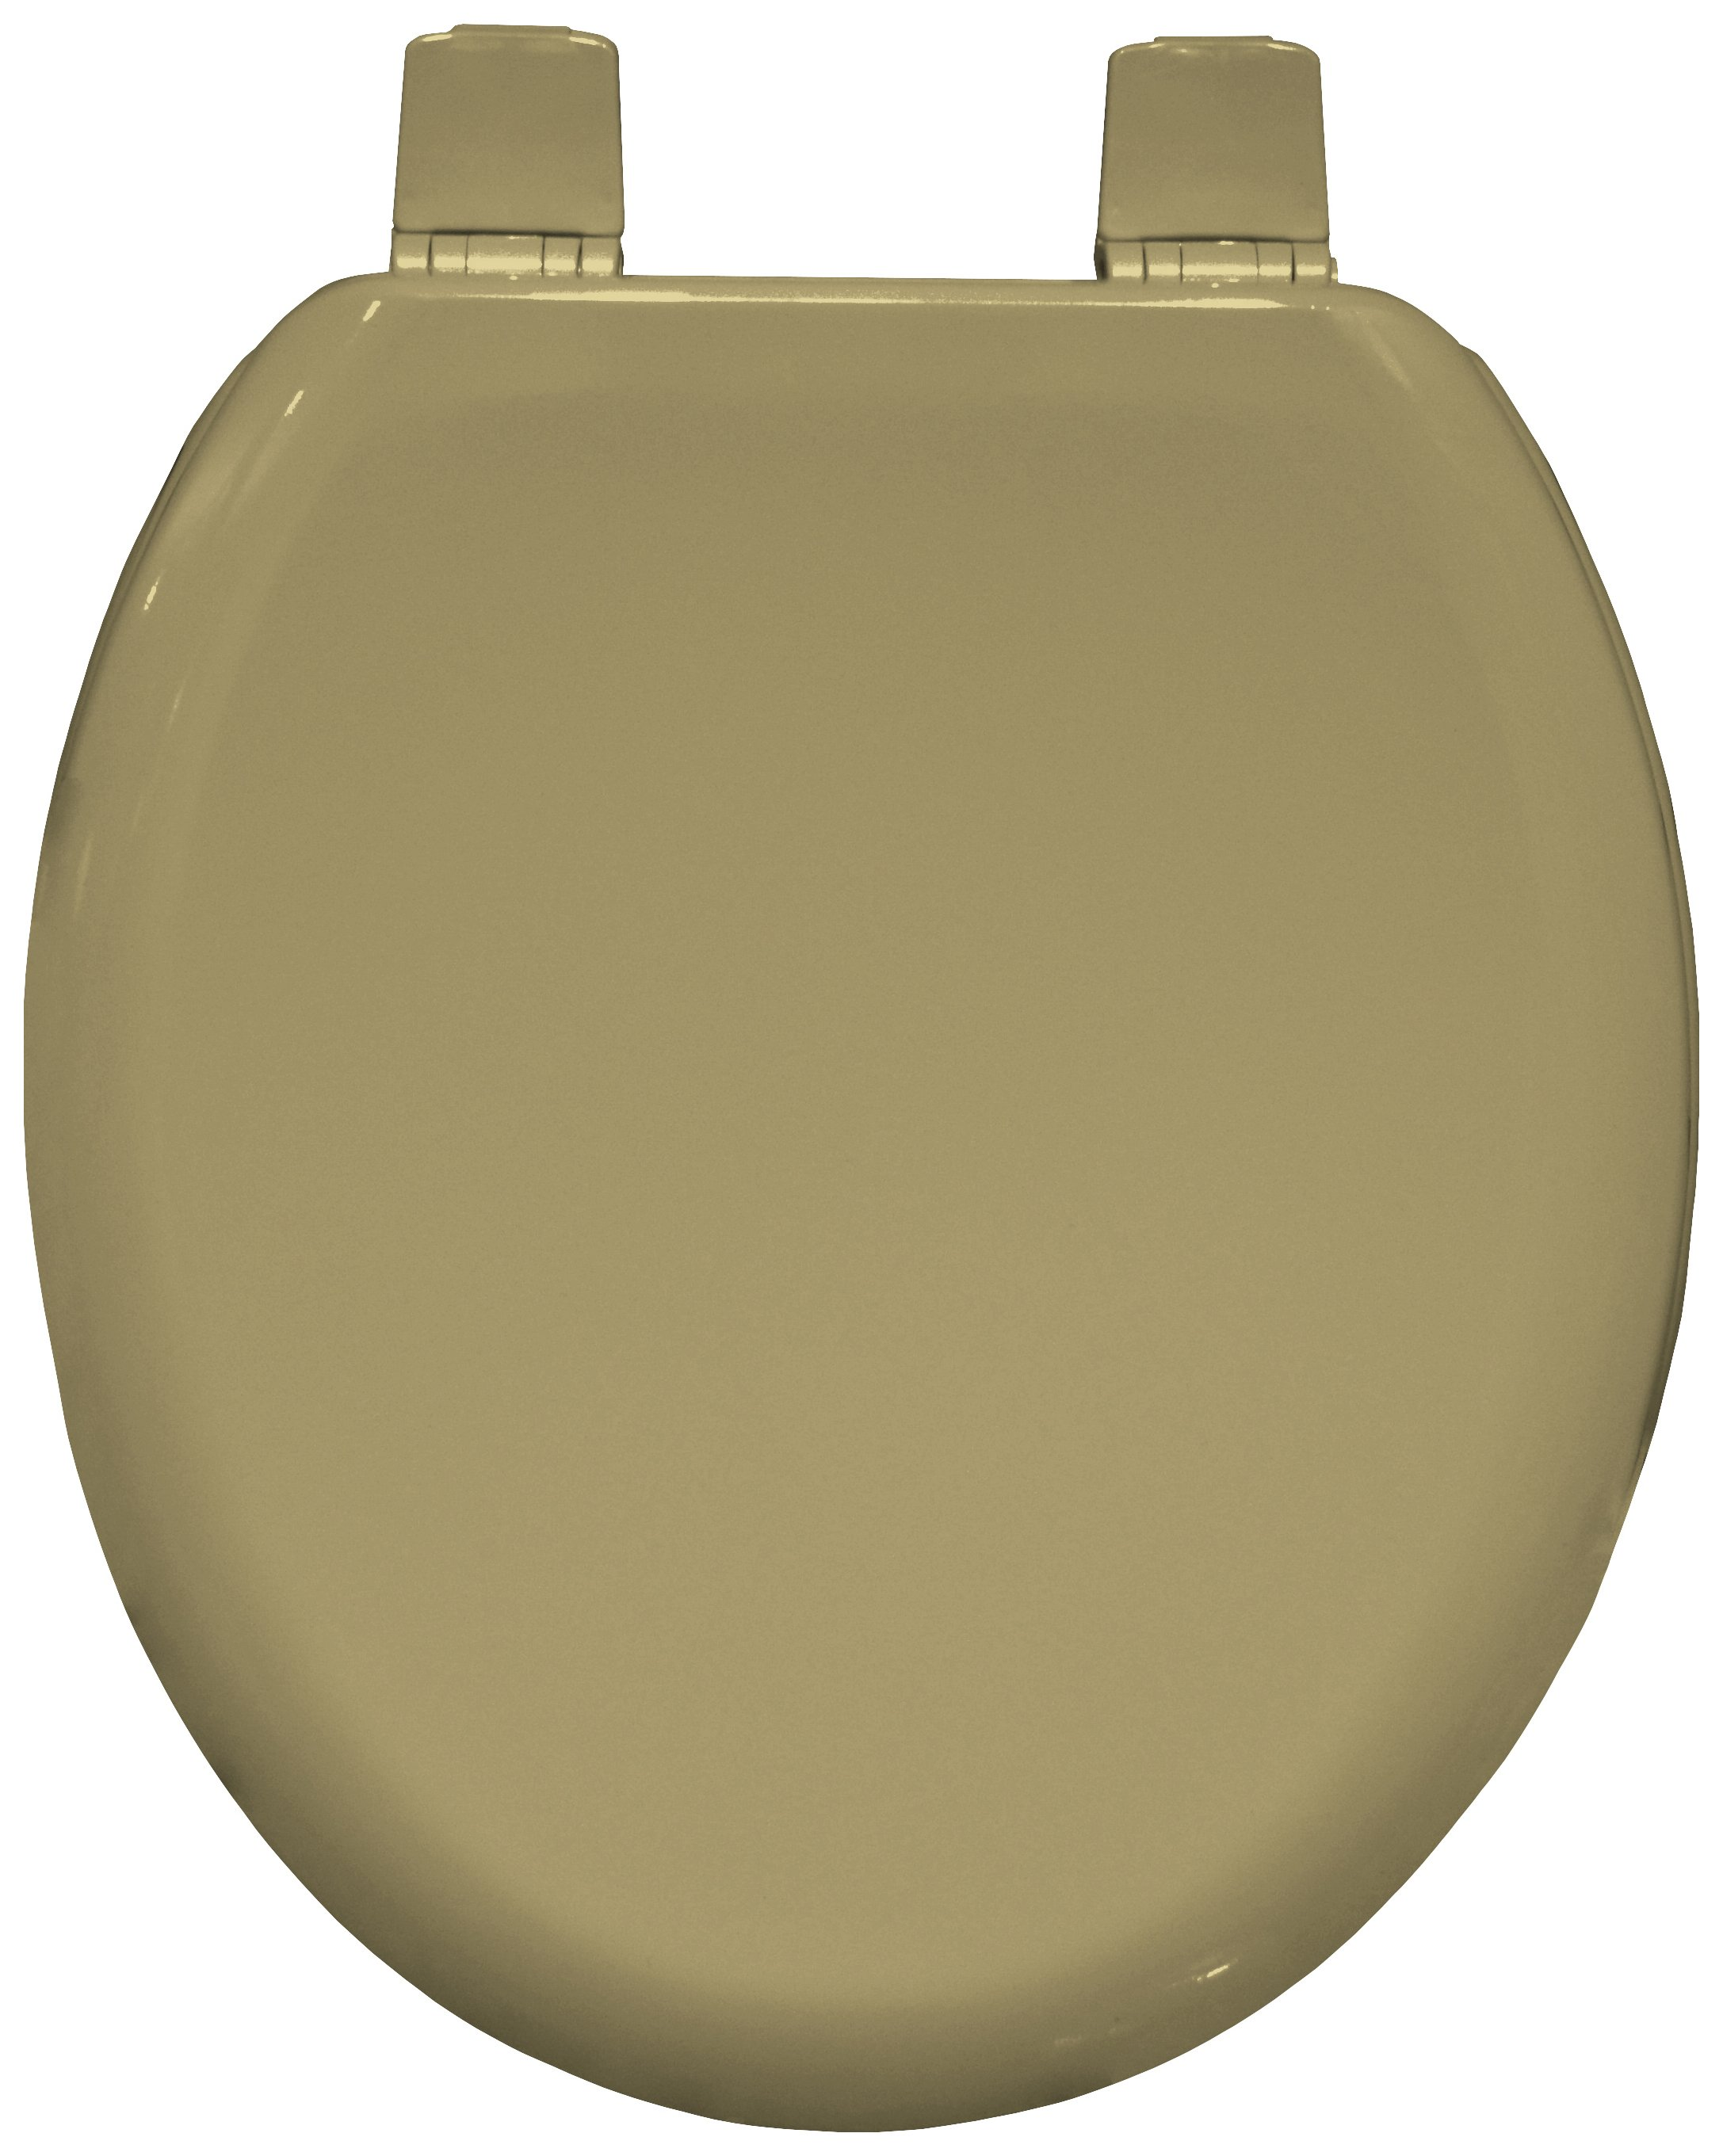 Bemis Chicago Moulded Wood Statite Toilet Seat - Avocado